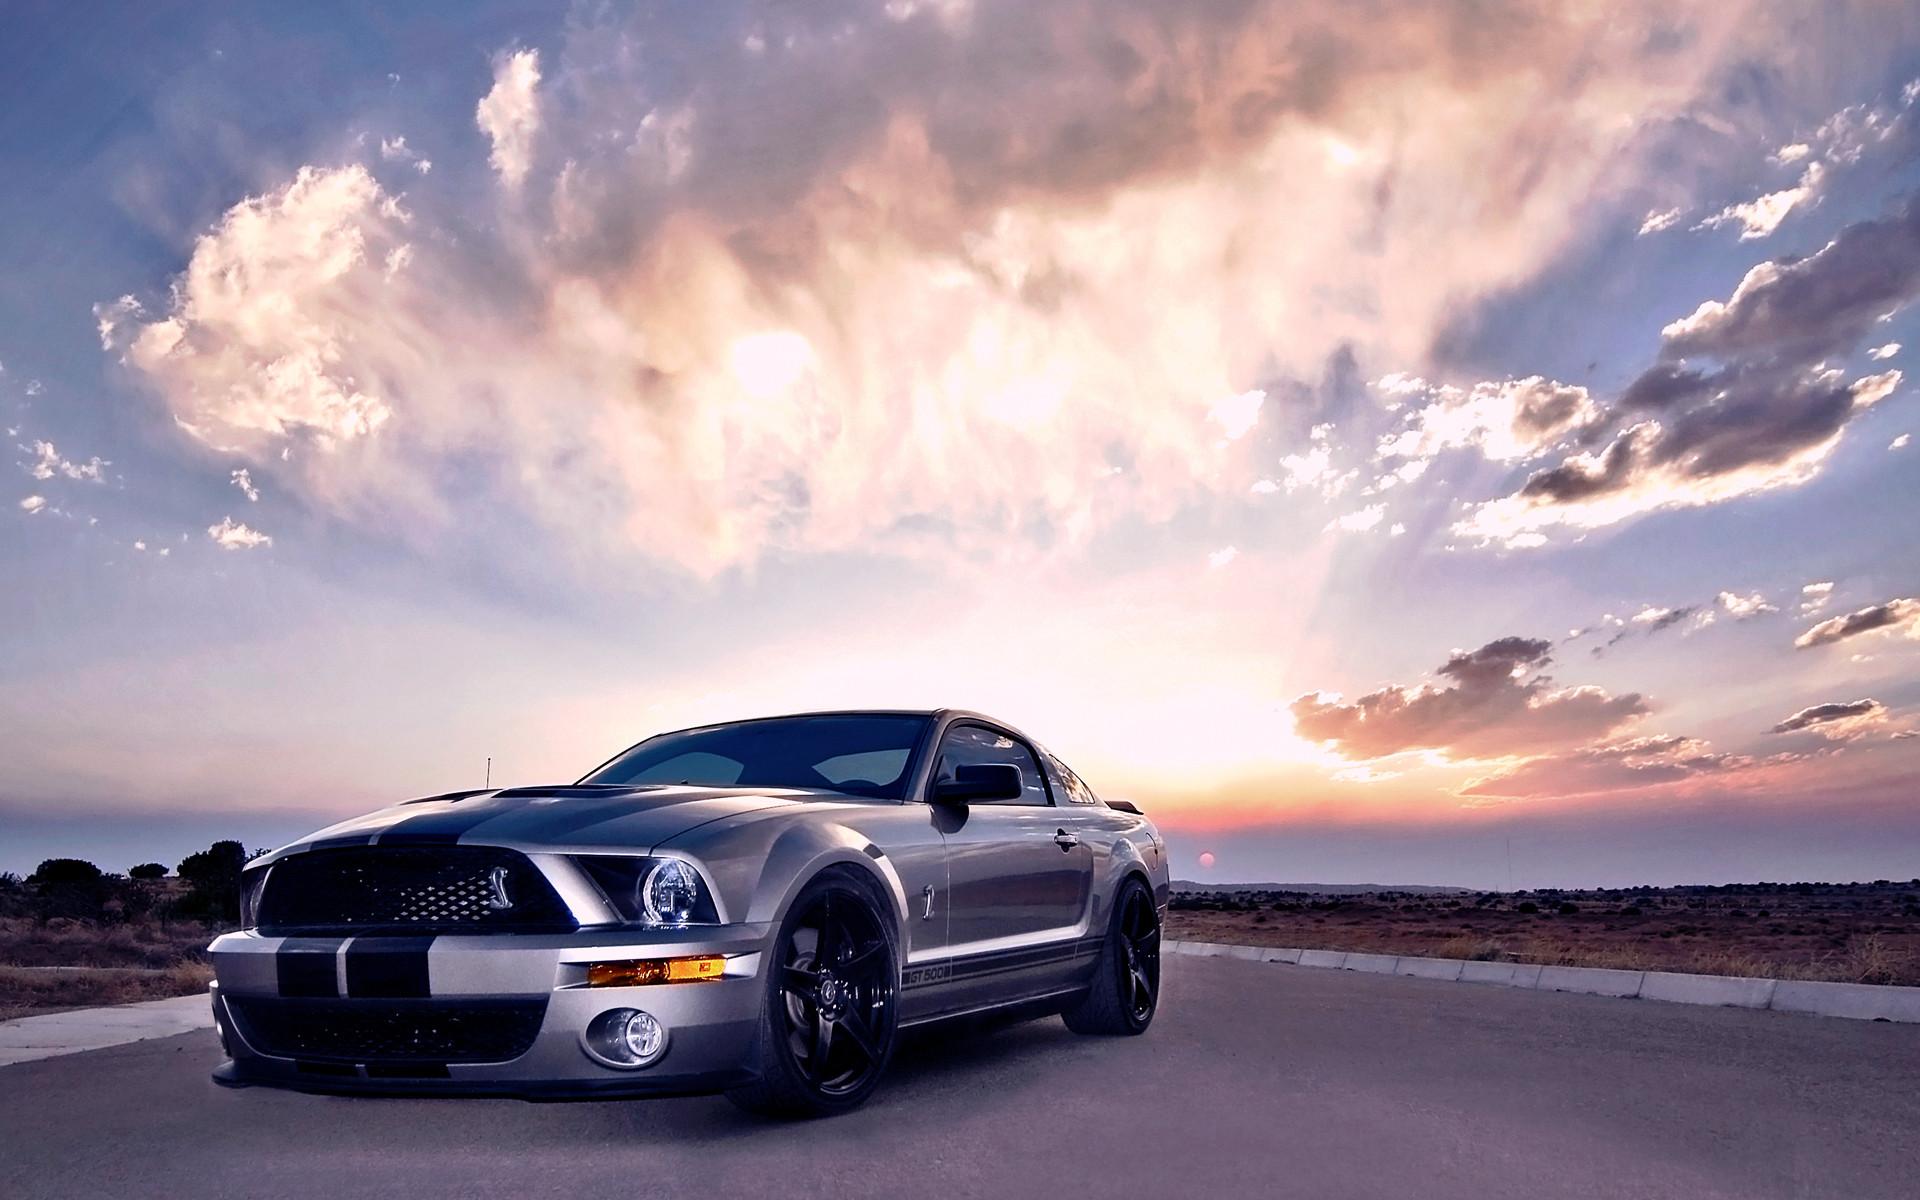 Shelby Cobra Wallpaper 44666